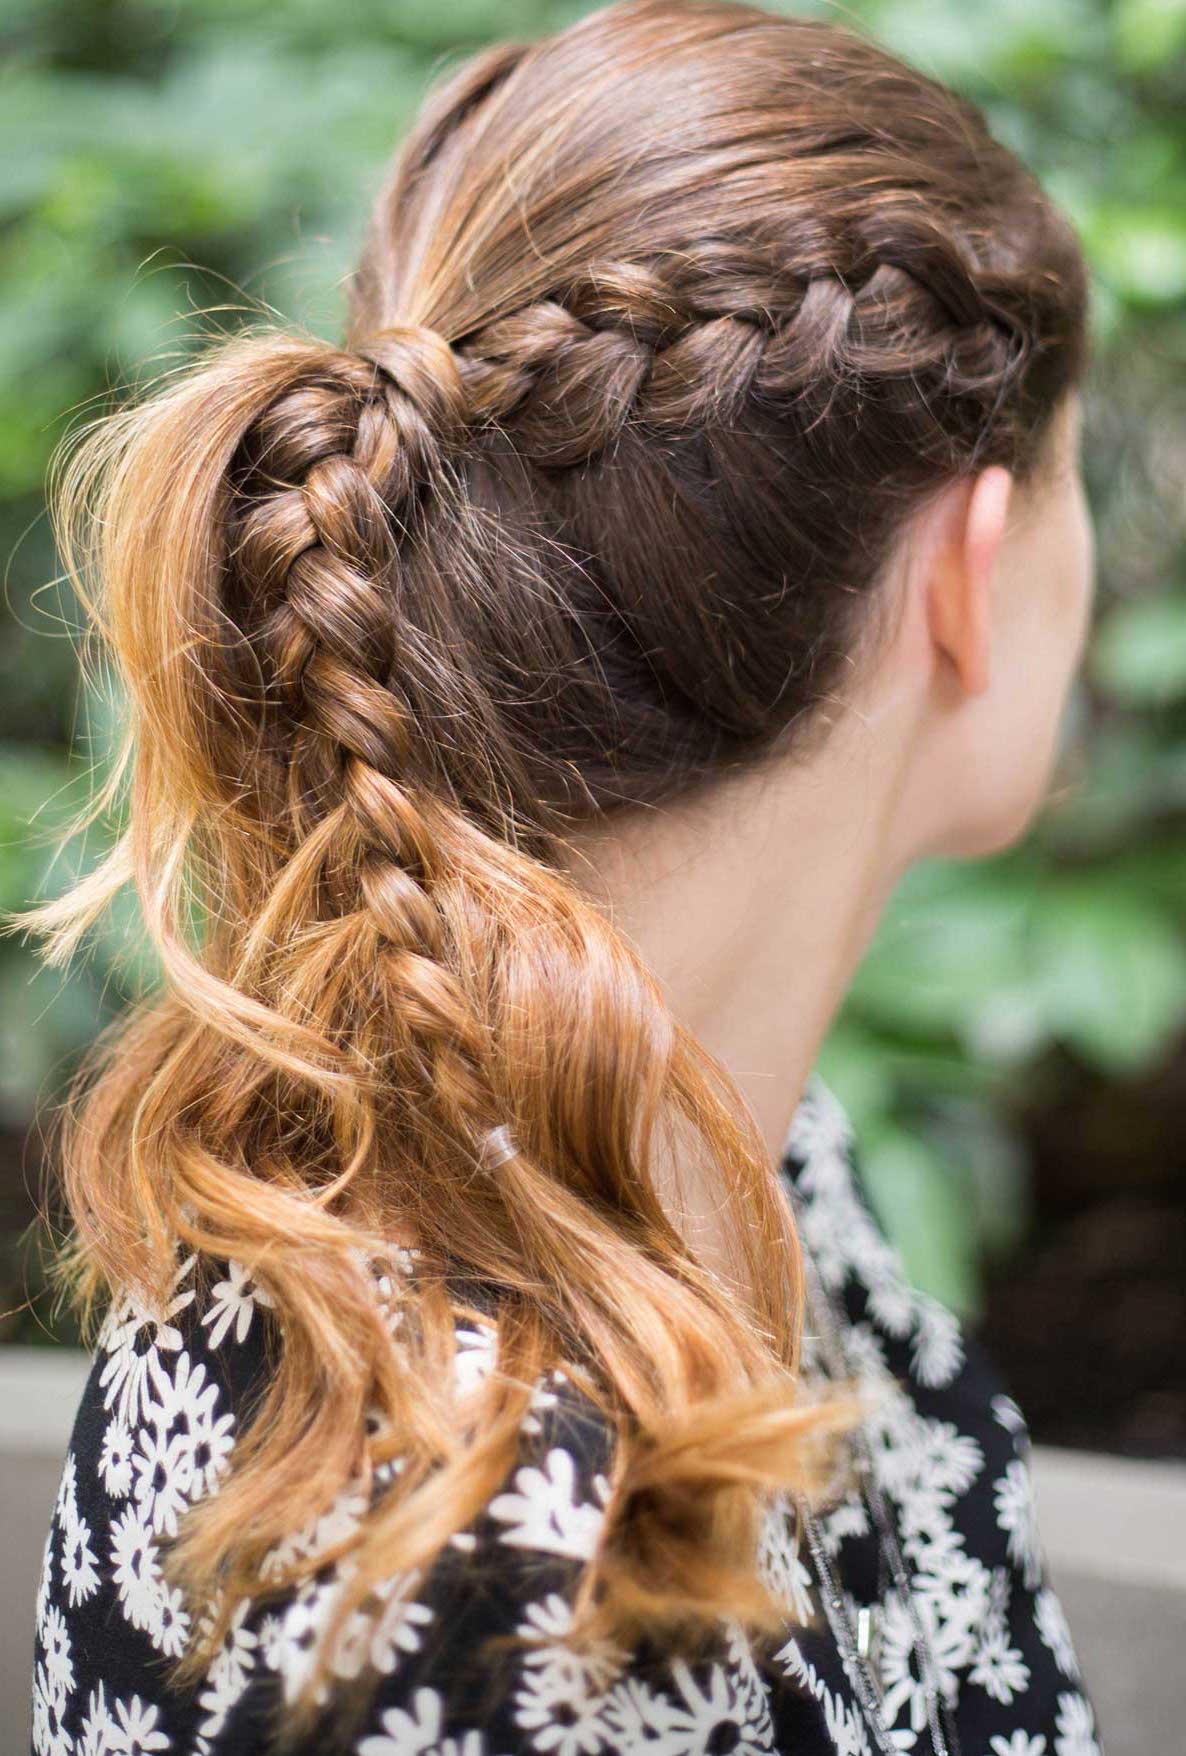 bestie-braid hair 10